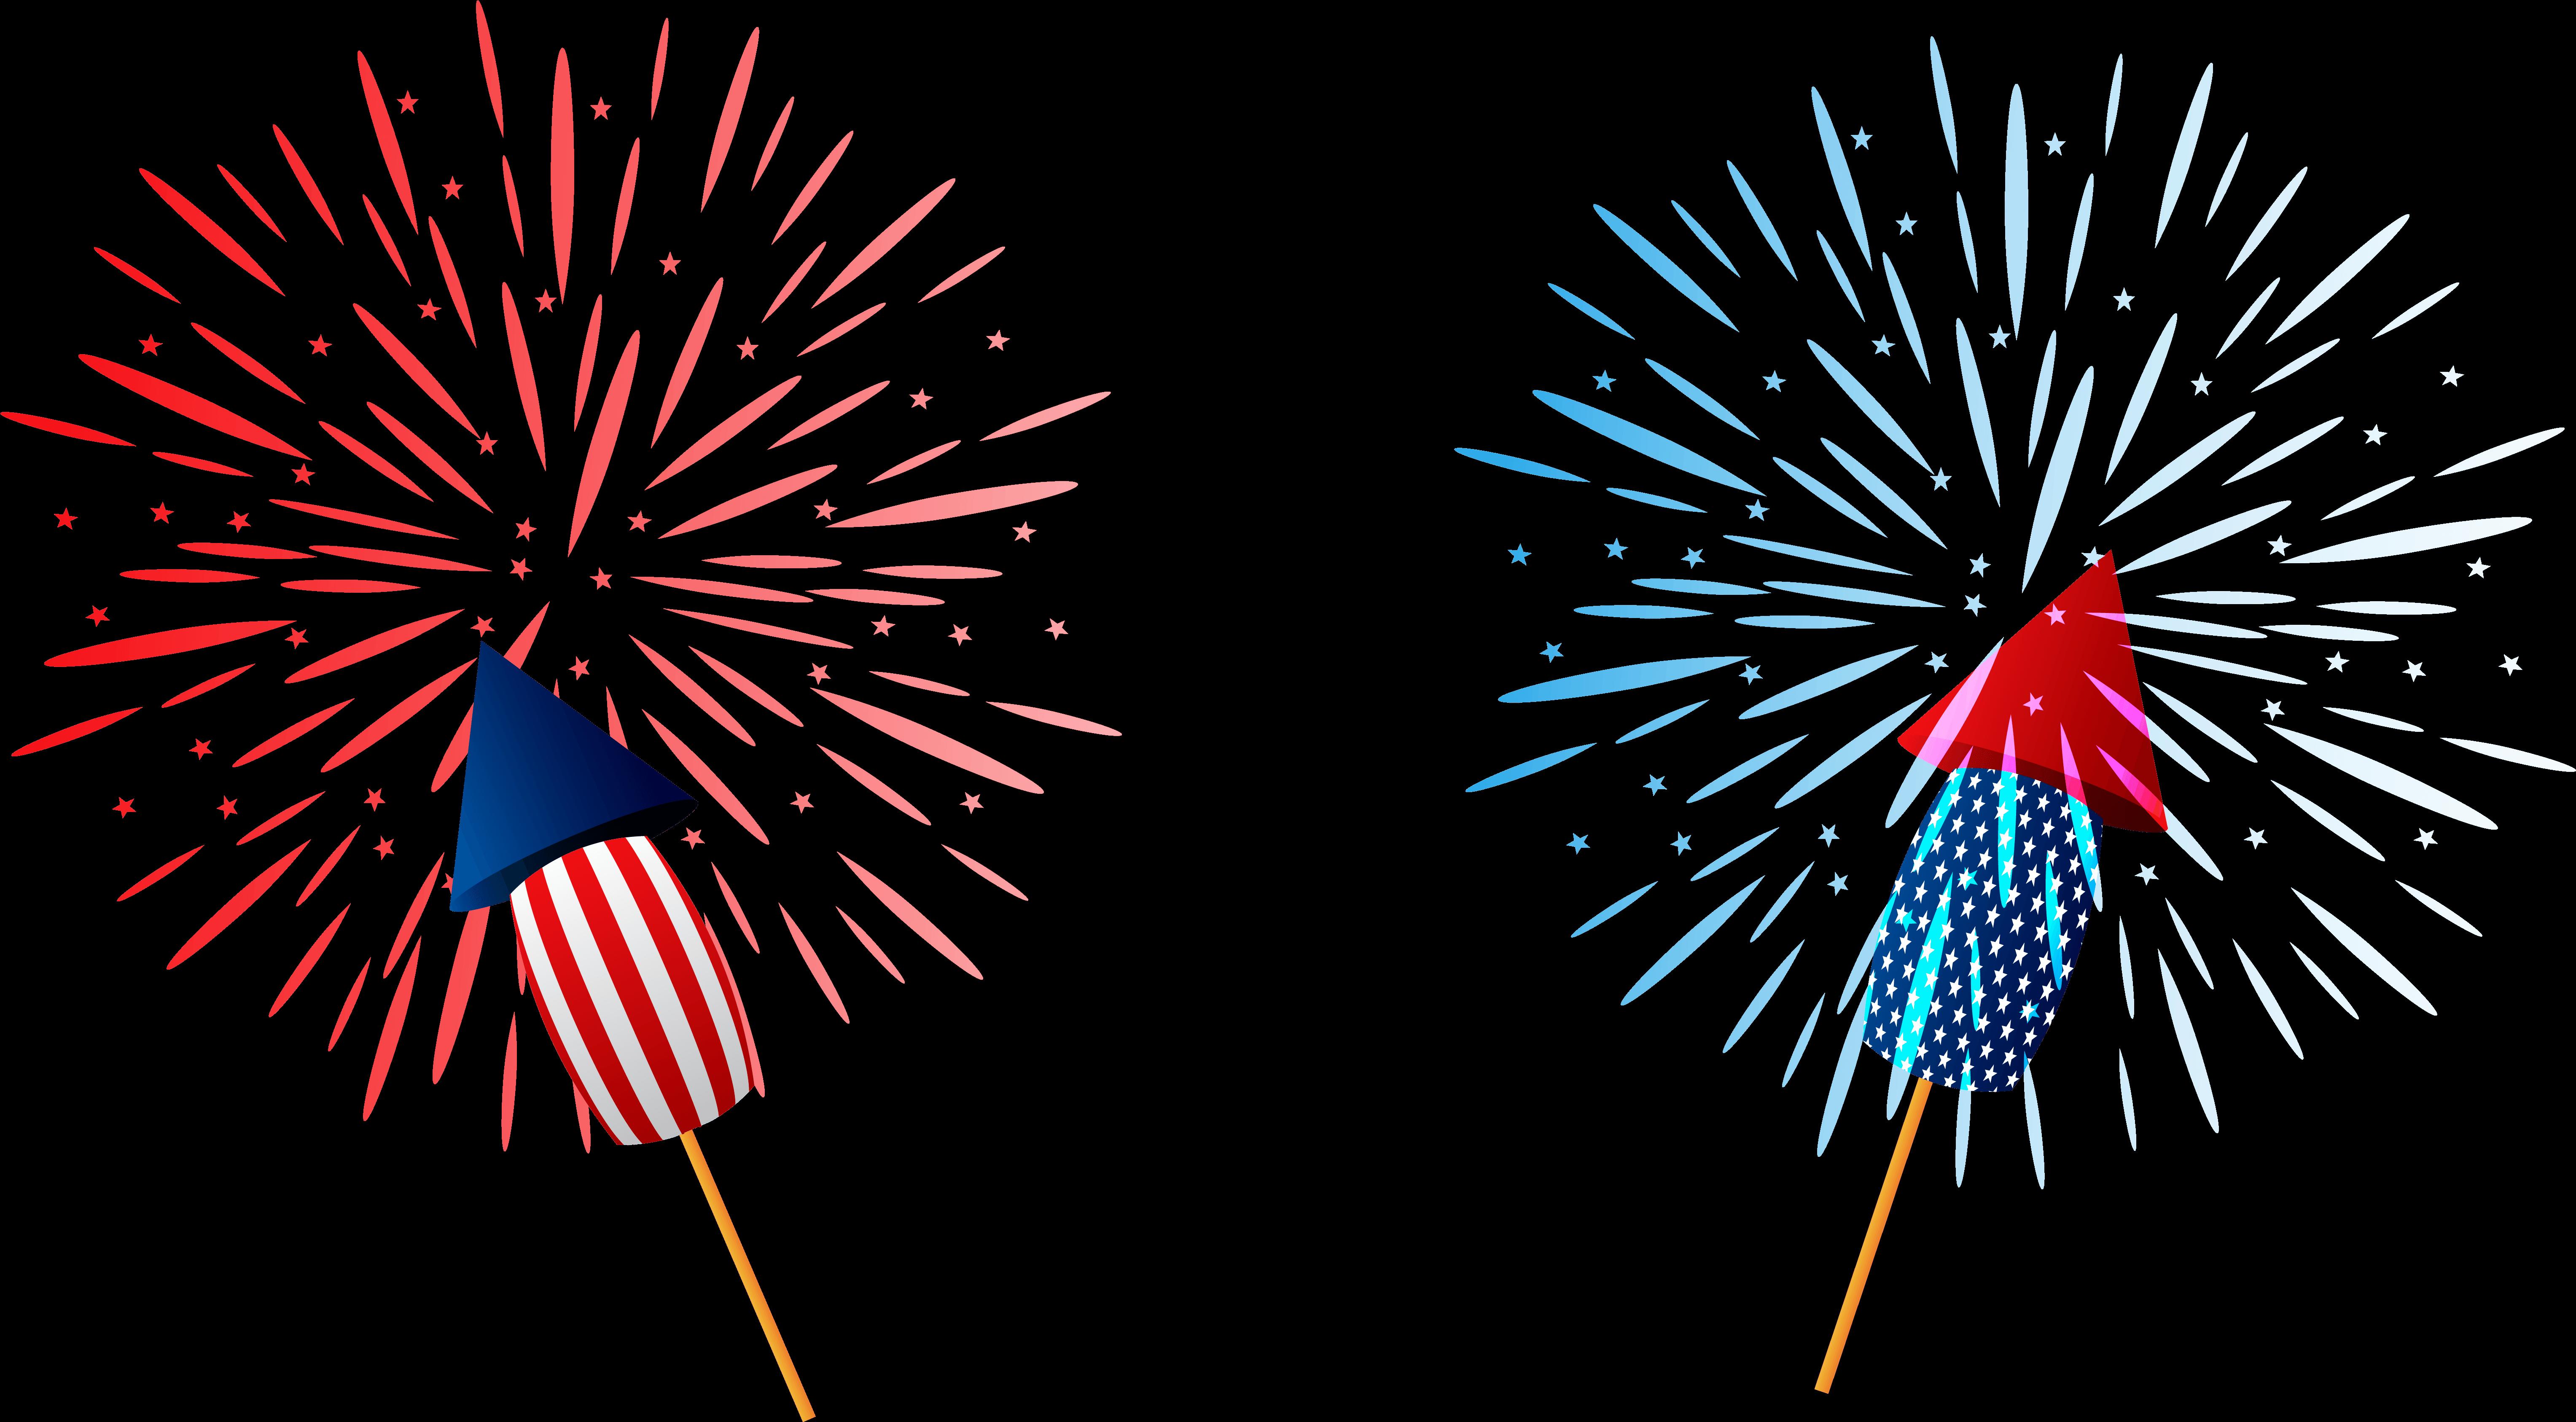 4th of july fireworks clipart with transparent background jpg transparent download Sparklers Png Clipart Image - 4th Of July Sparklers Clipart ... jpg transparent download